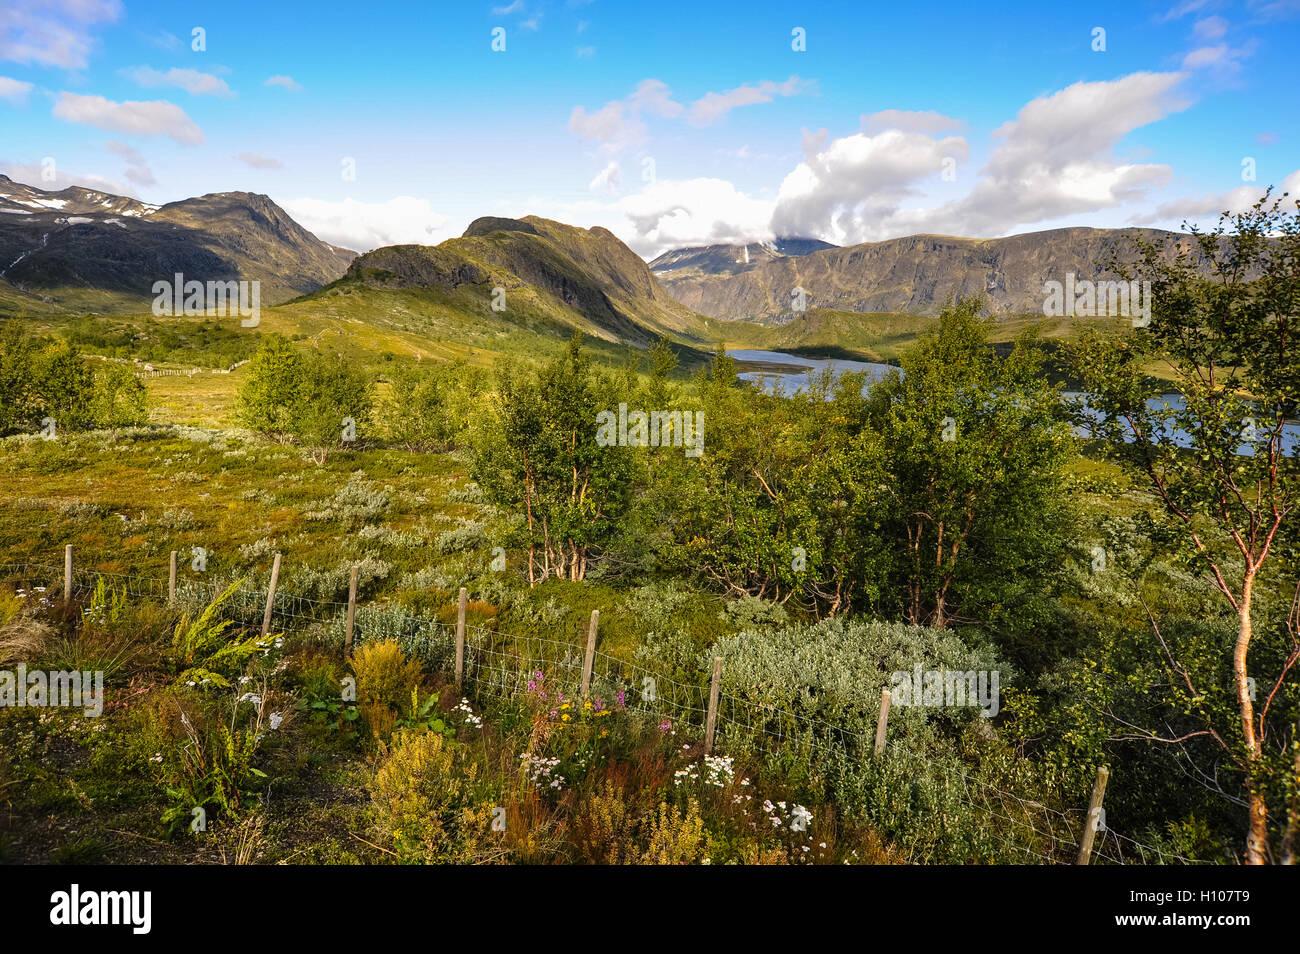 Norway, Oppland, Valdresflya. Just south of the Gjende Lake and Besseggen, in Jotunheimen. - Stock Image